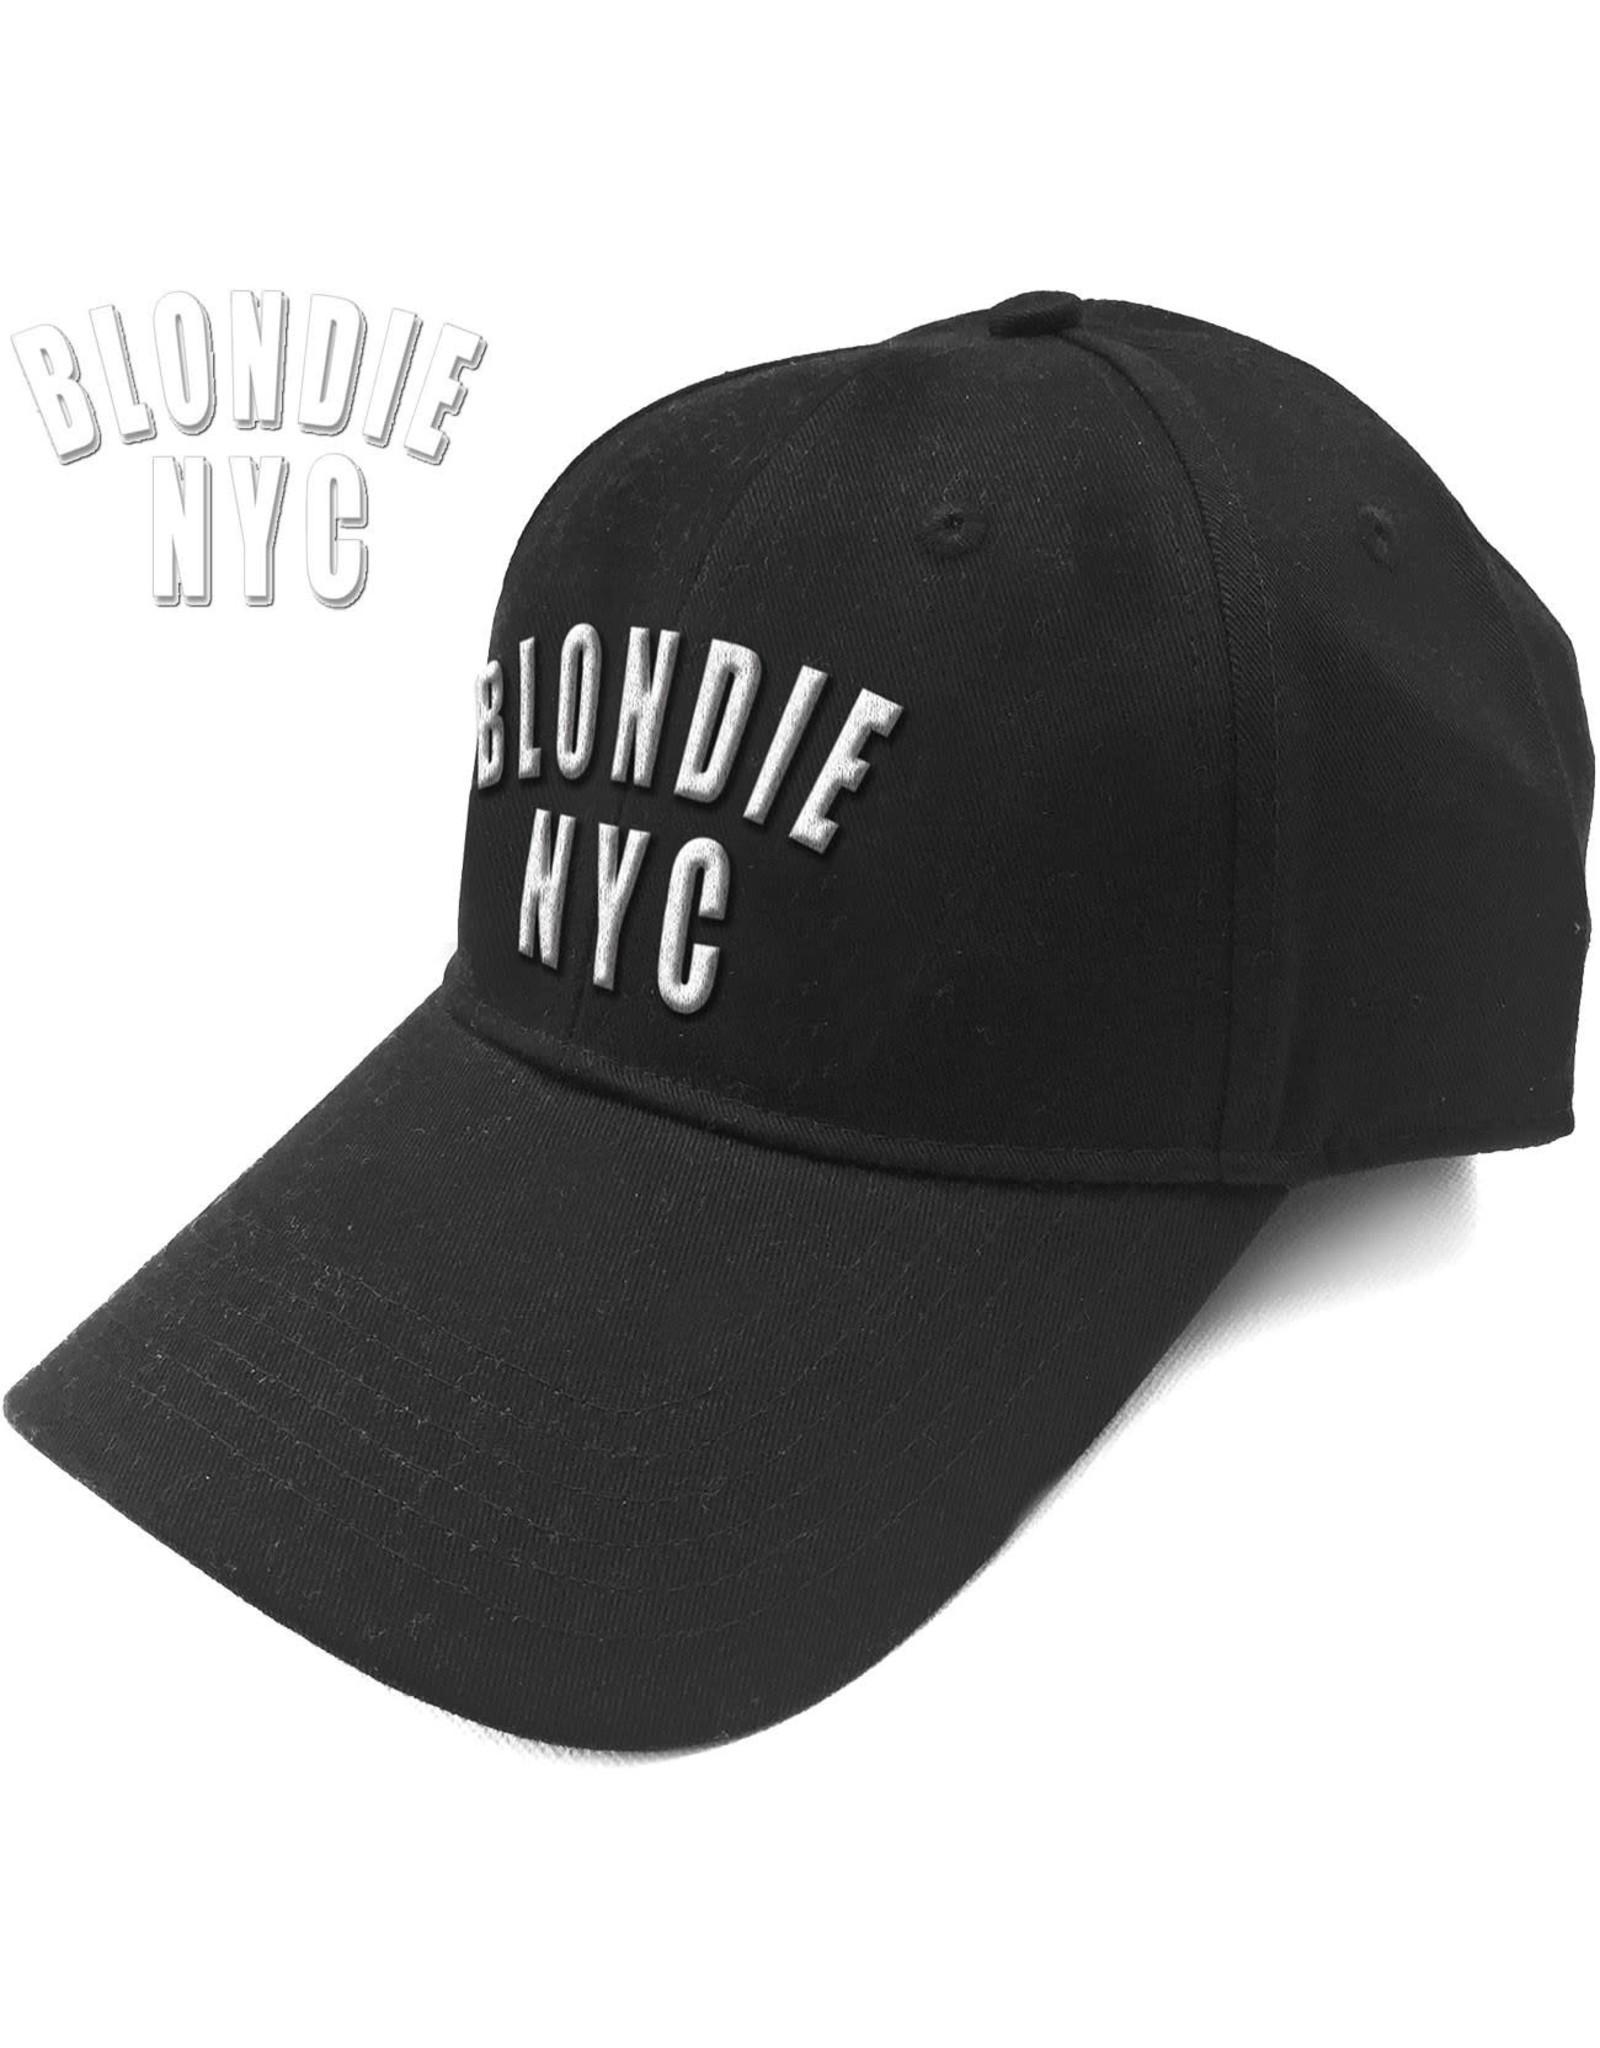 Blondie / NYC Baseball Cap